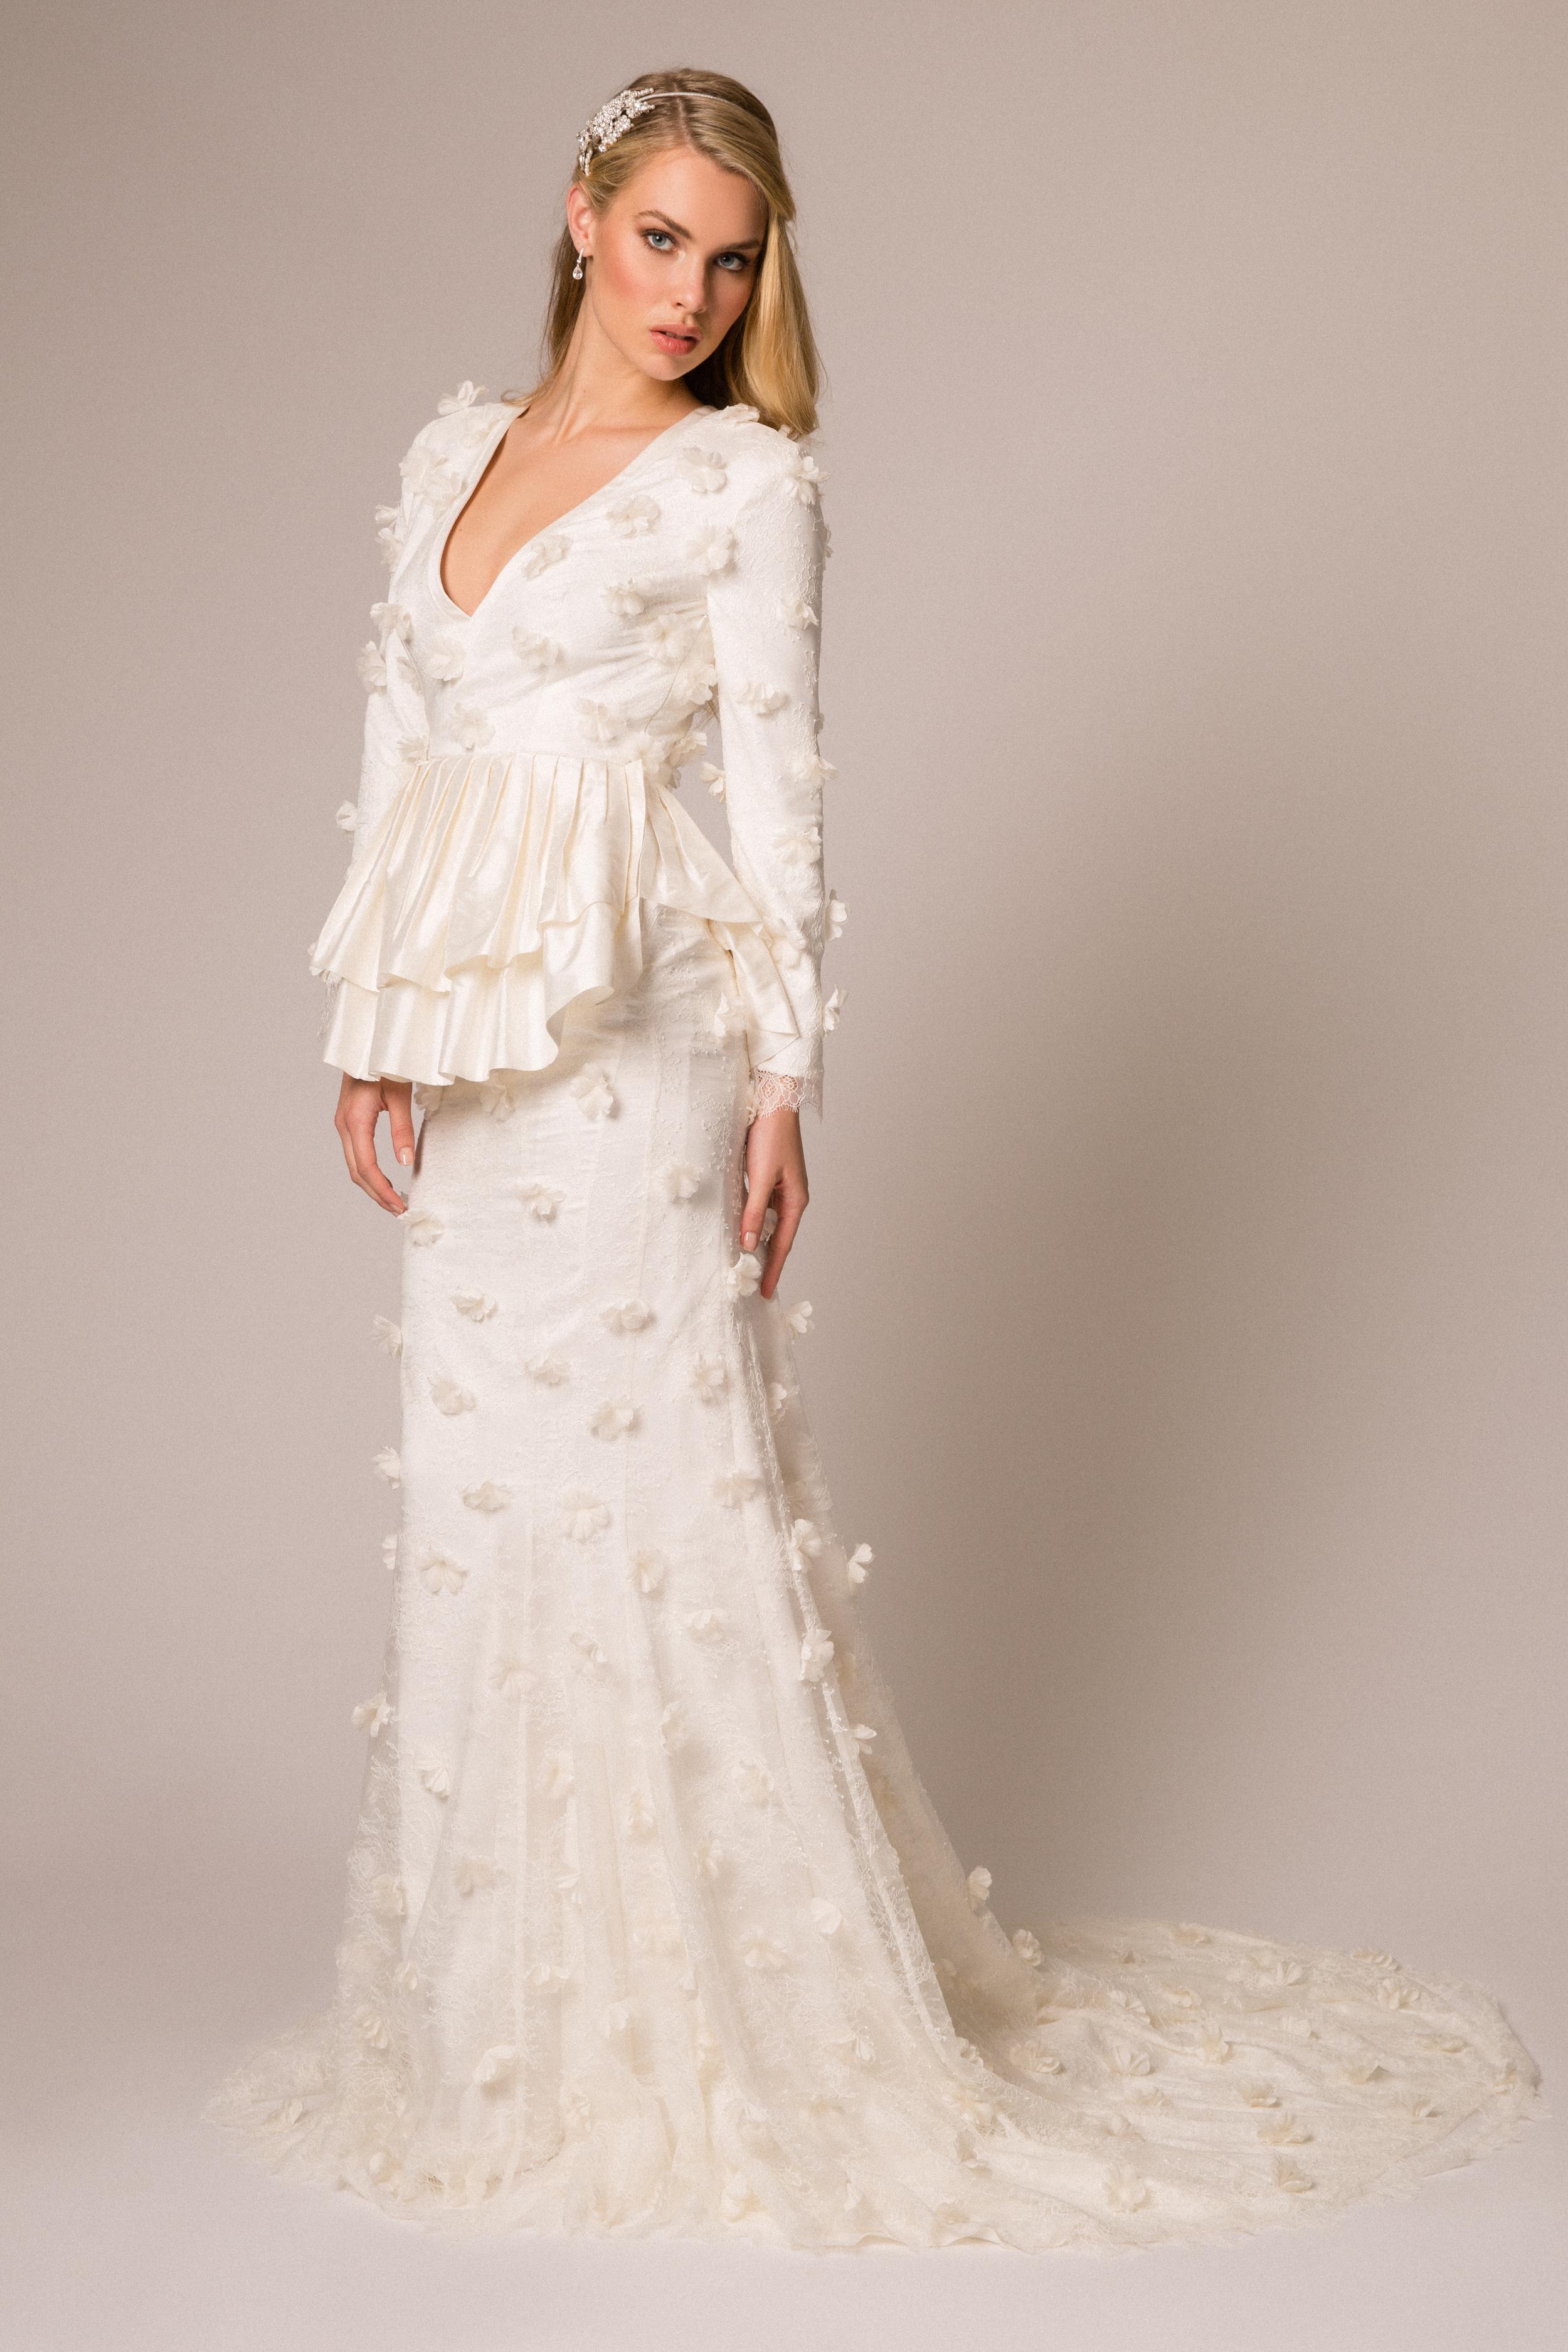 The Delphyne Dress